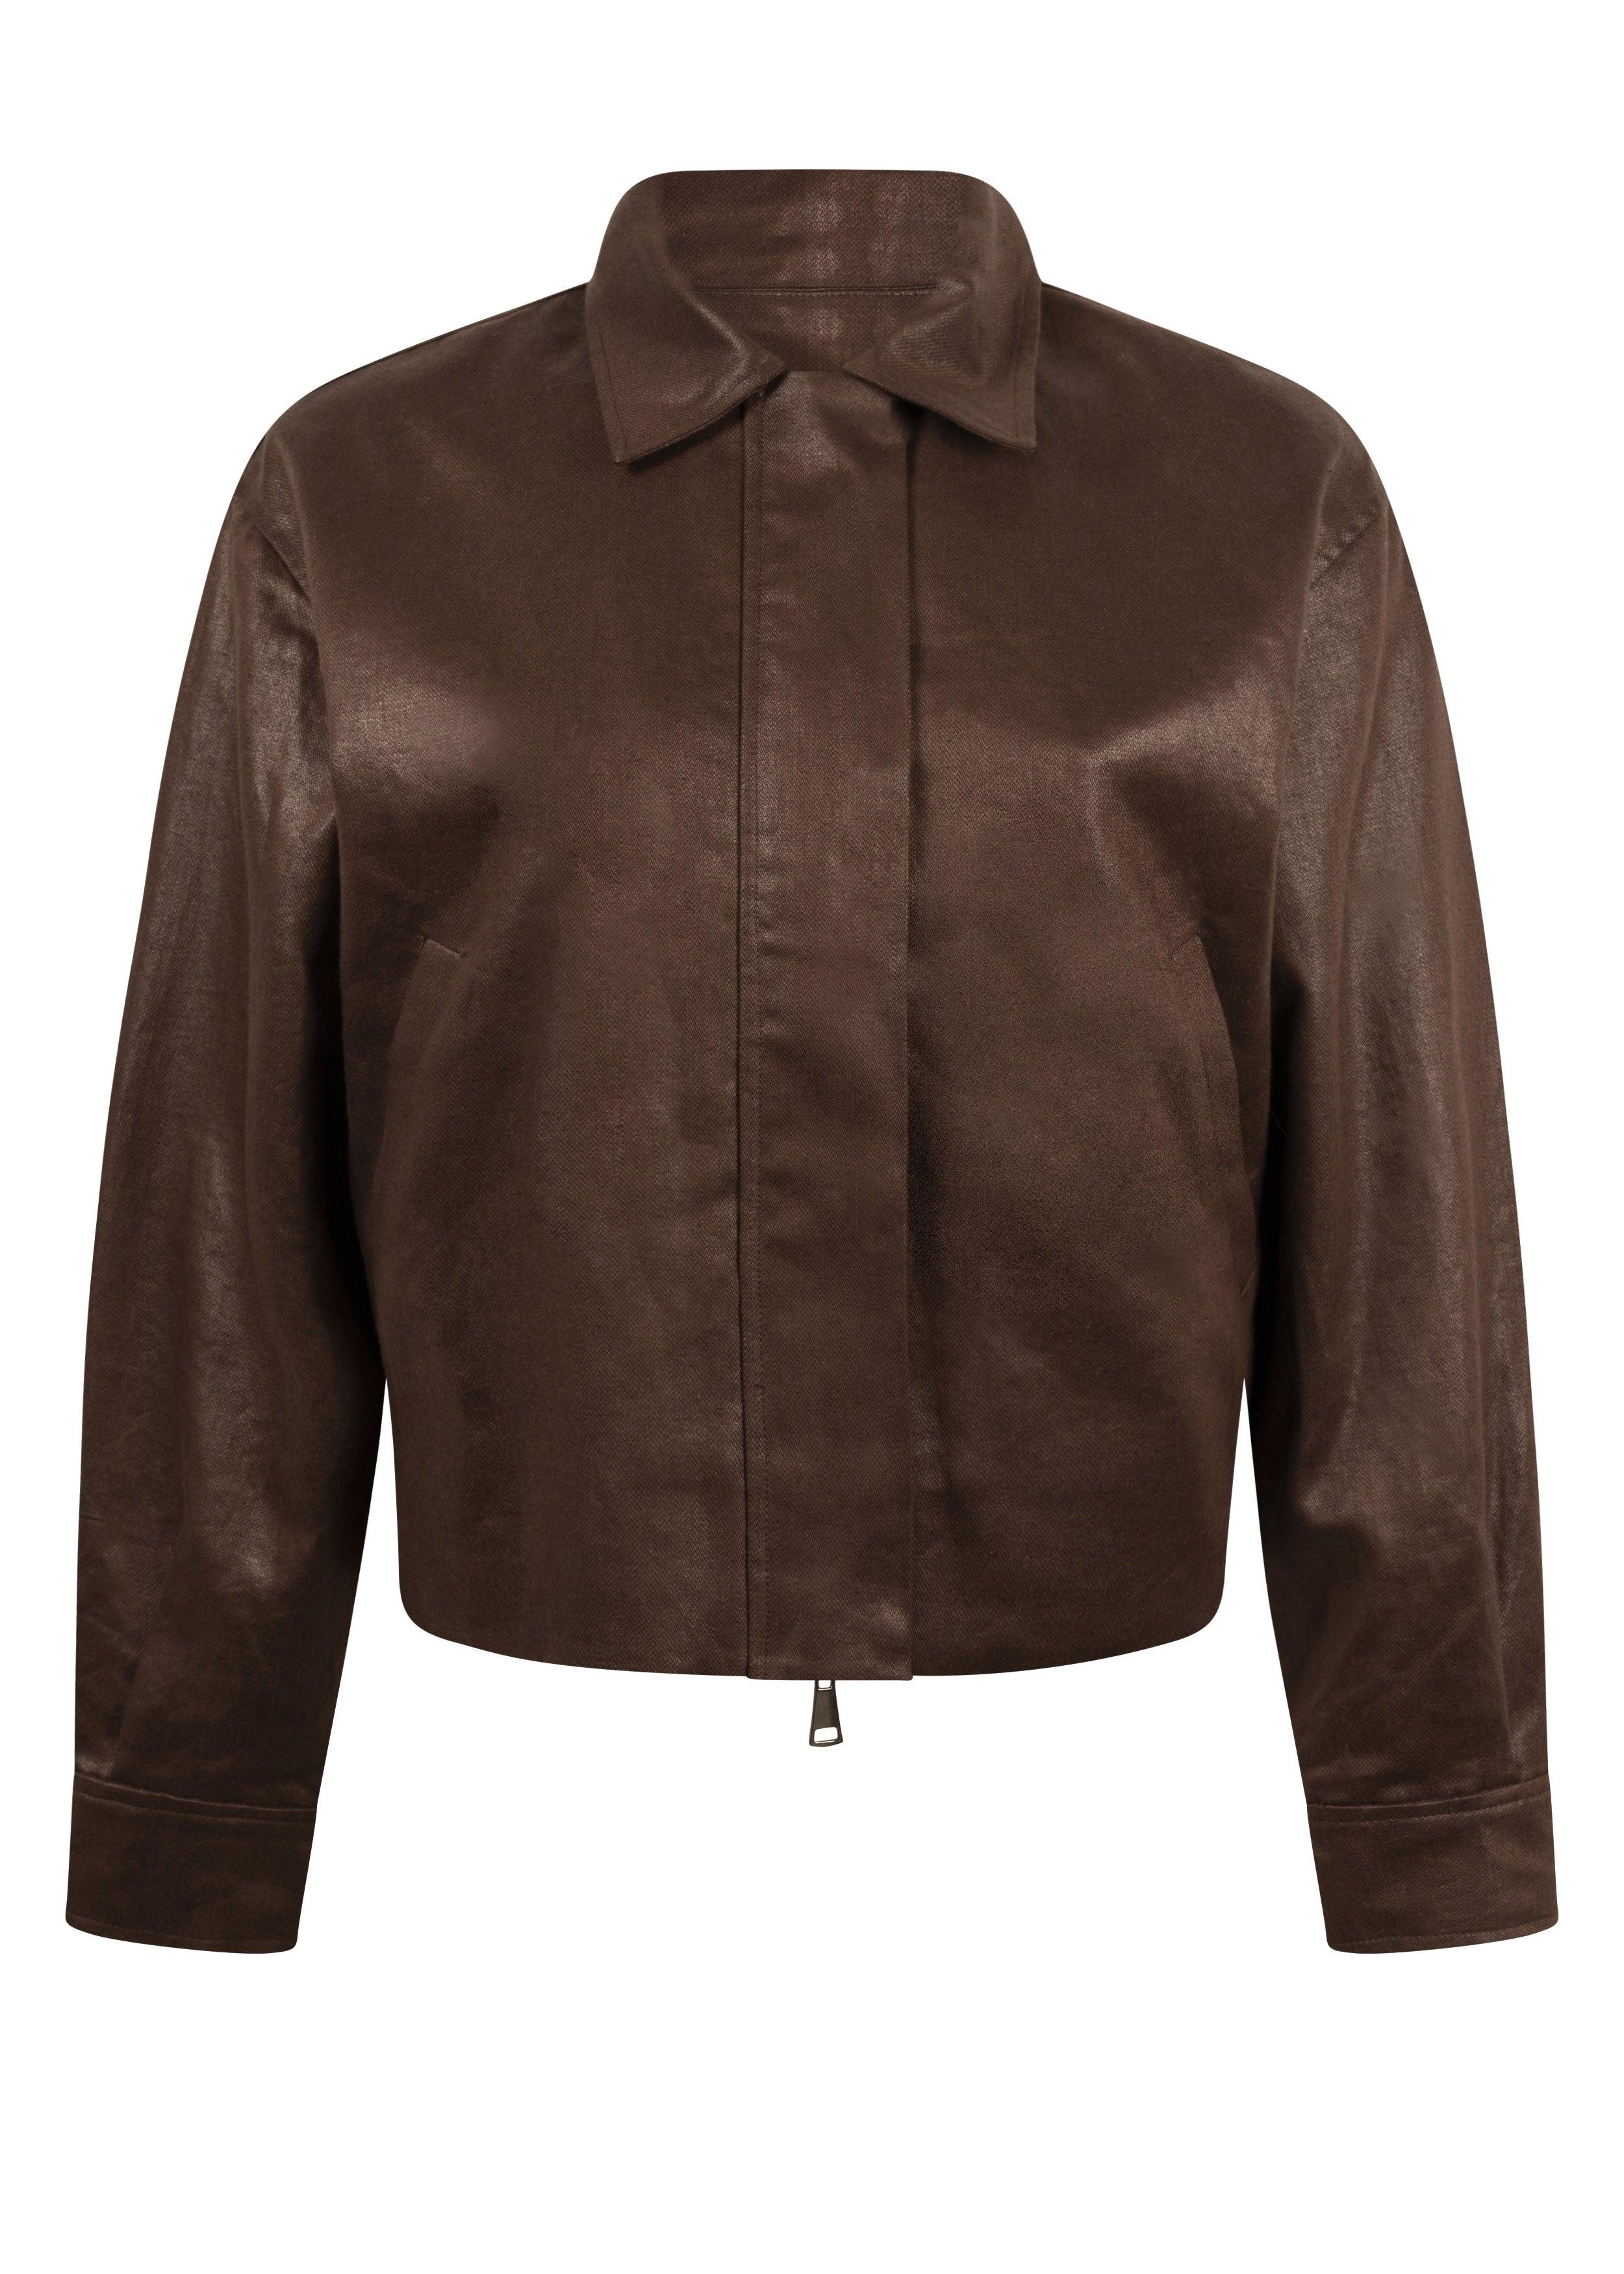 Alton Jacket, Chocolate